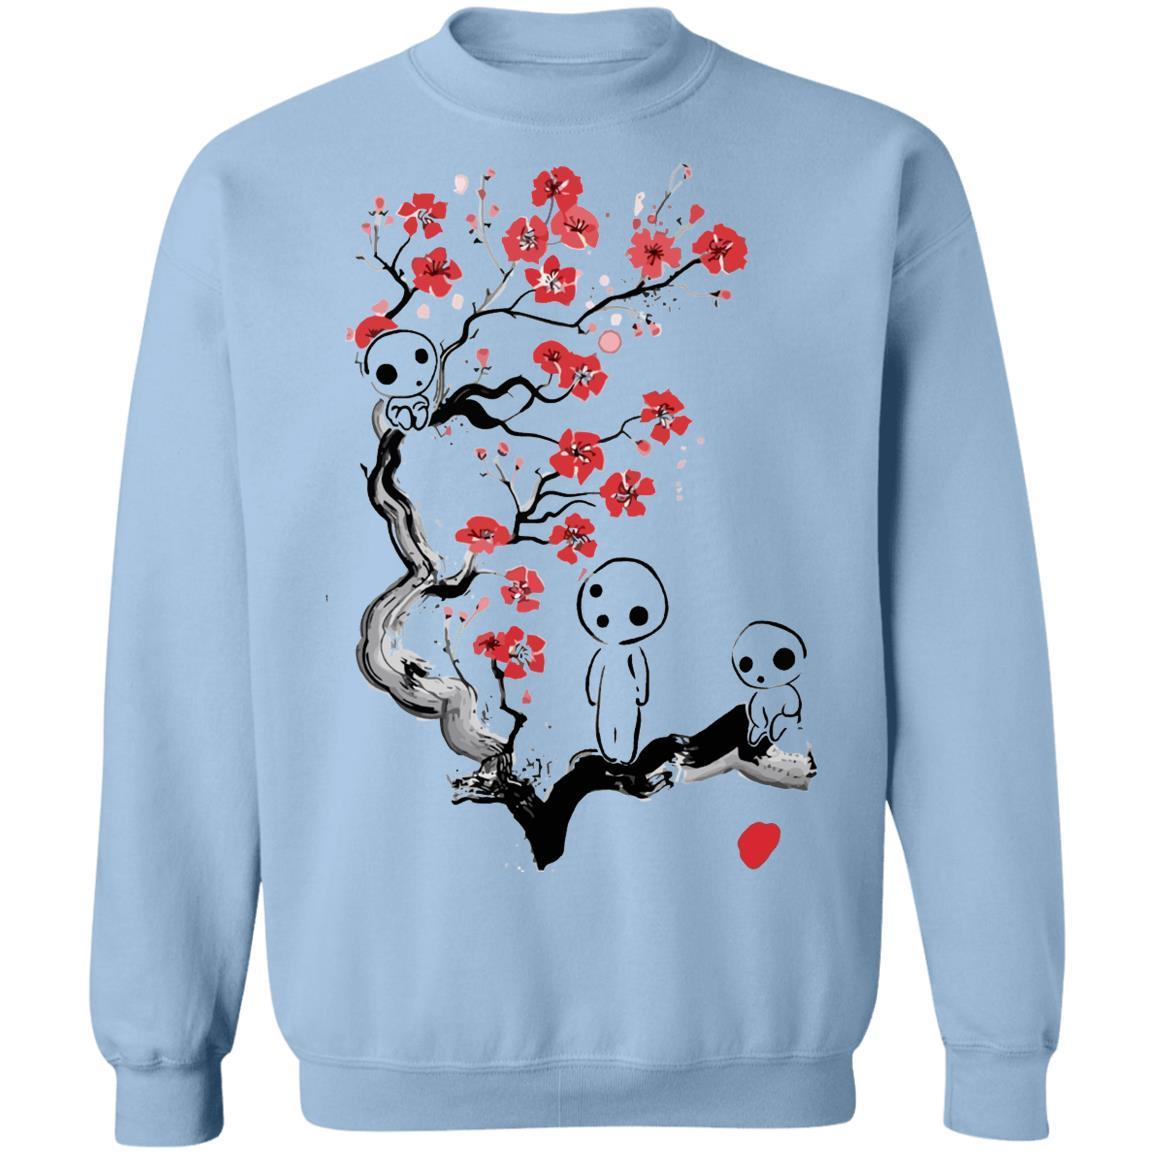 Princess Mononoke – Tree Spirits on the Cherry Blossom Sweatshirt Unisex